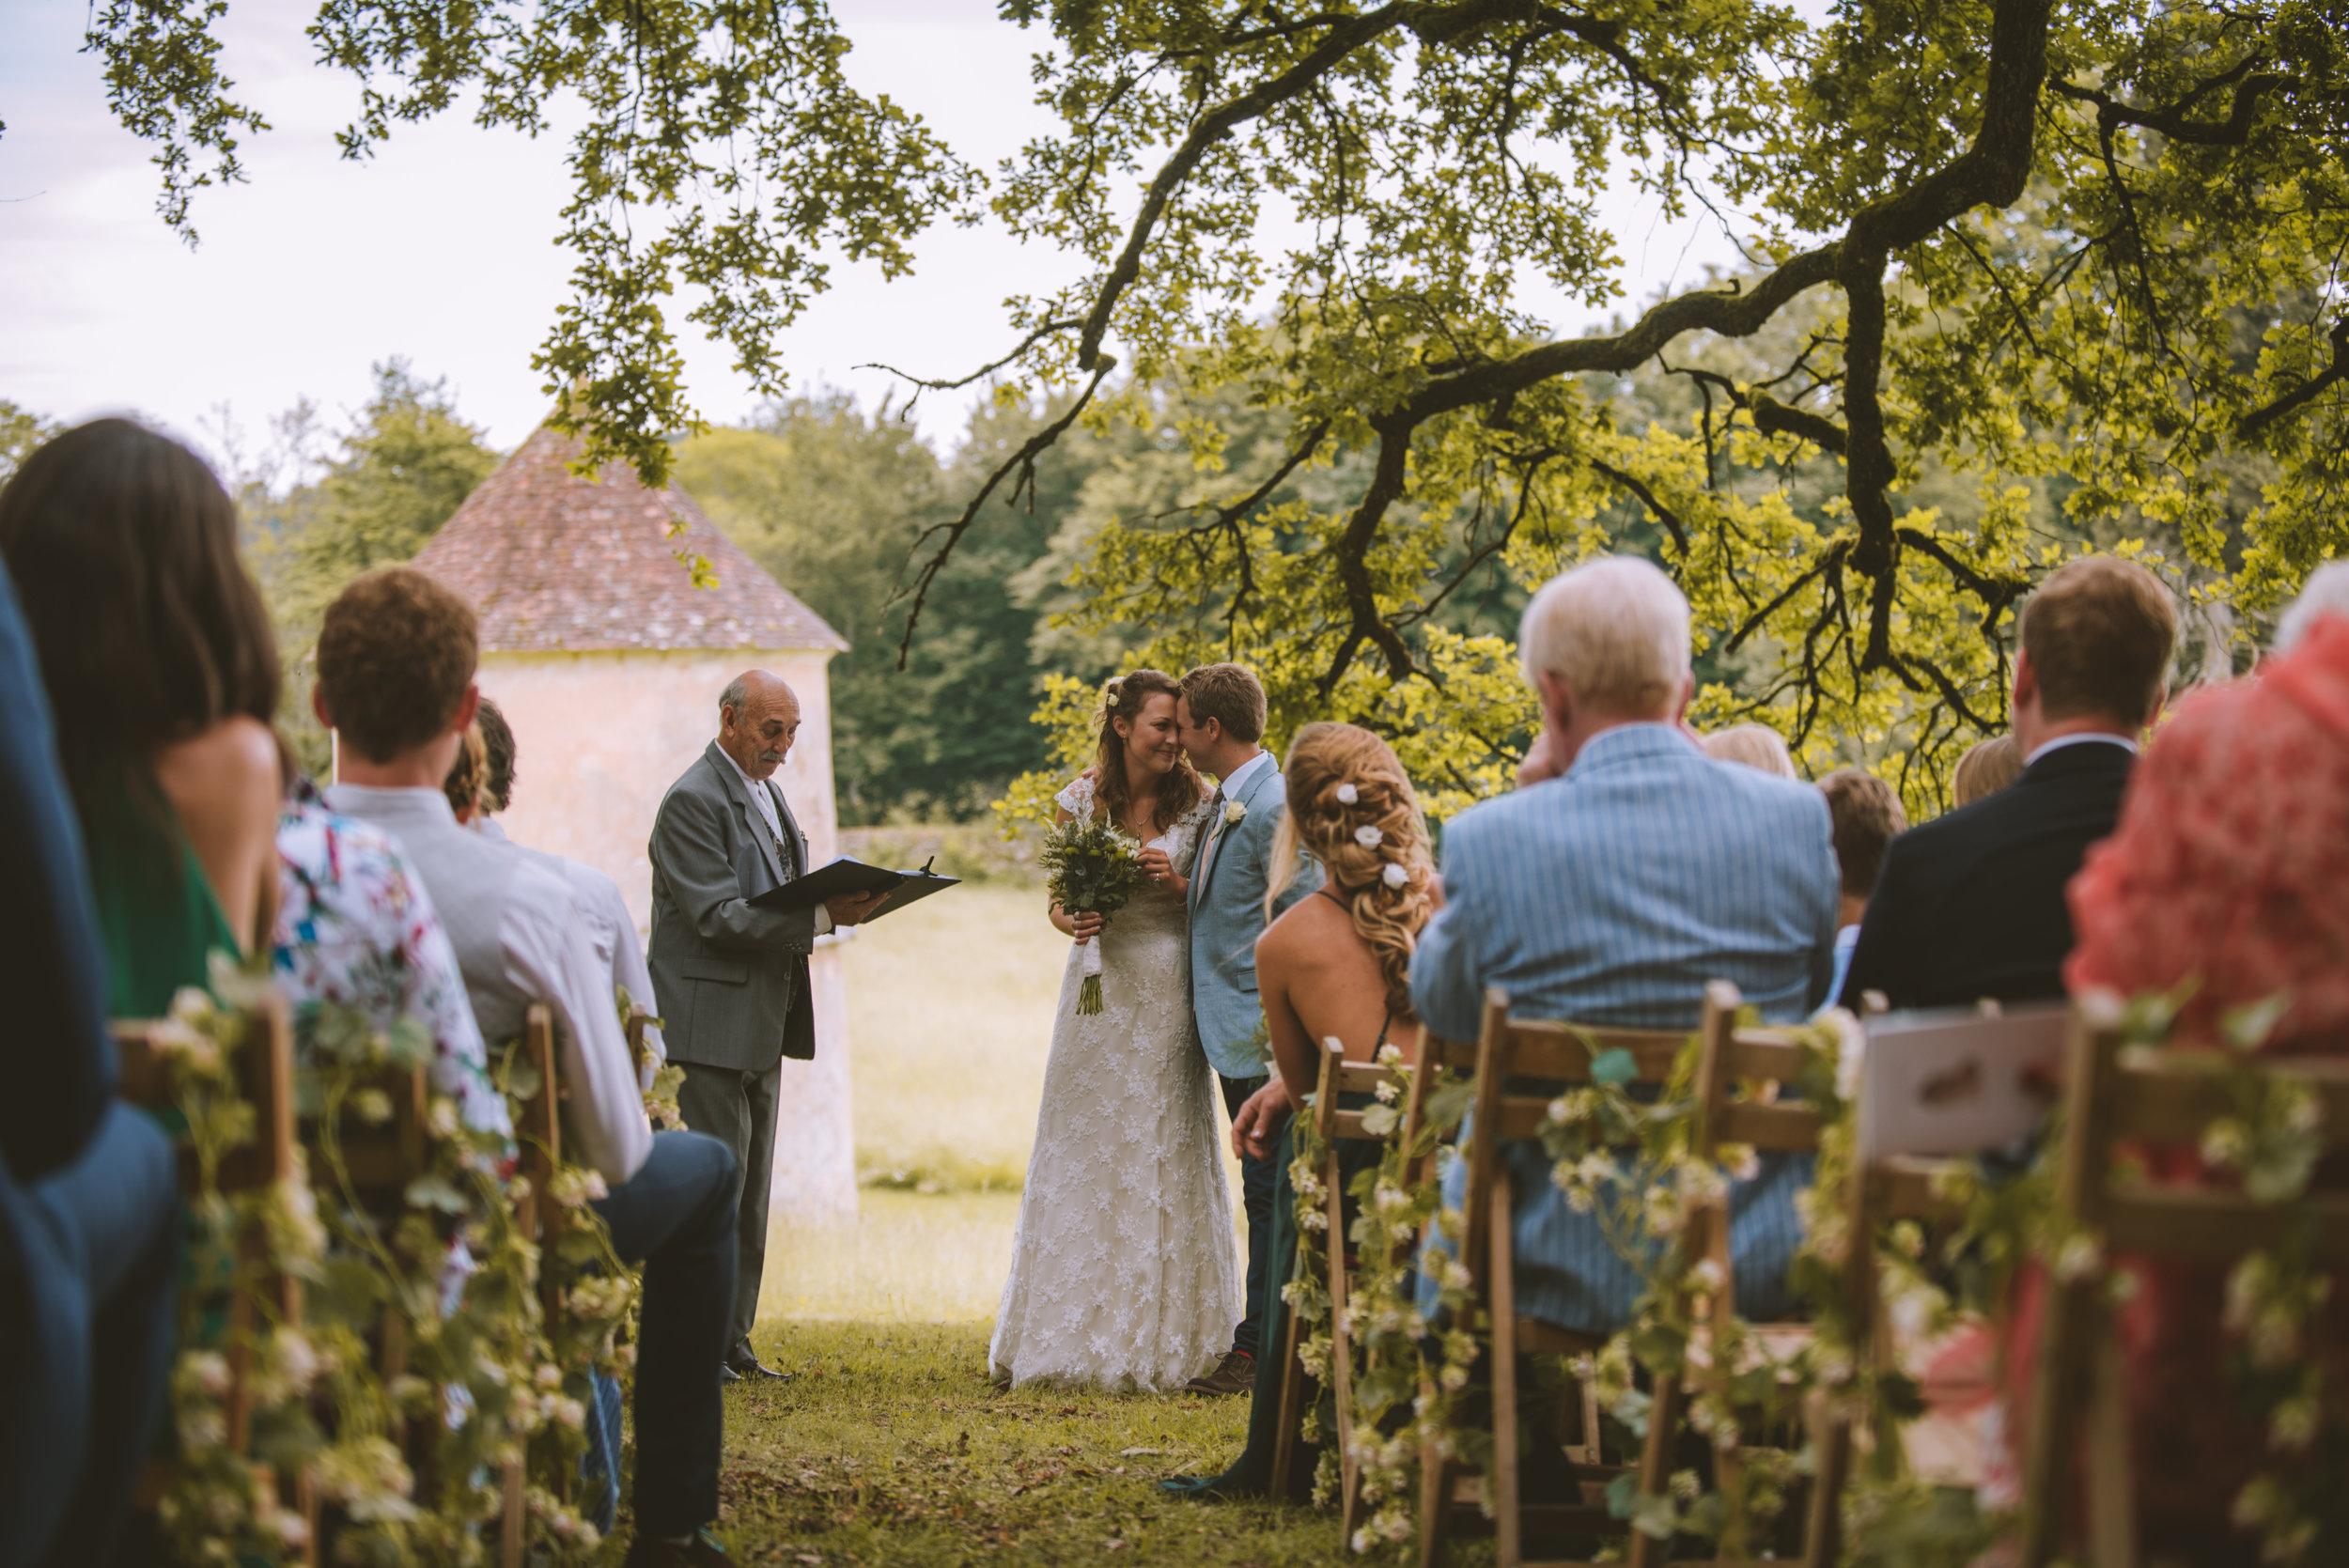 dordogne-wedding-photographer-mark-shaw-25.jpg